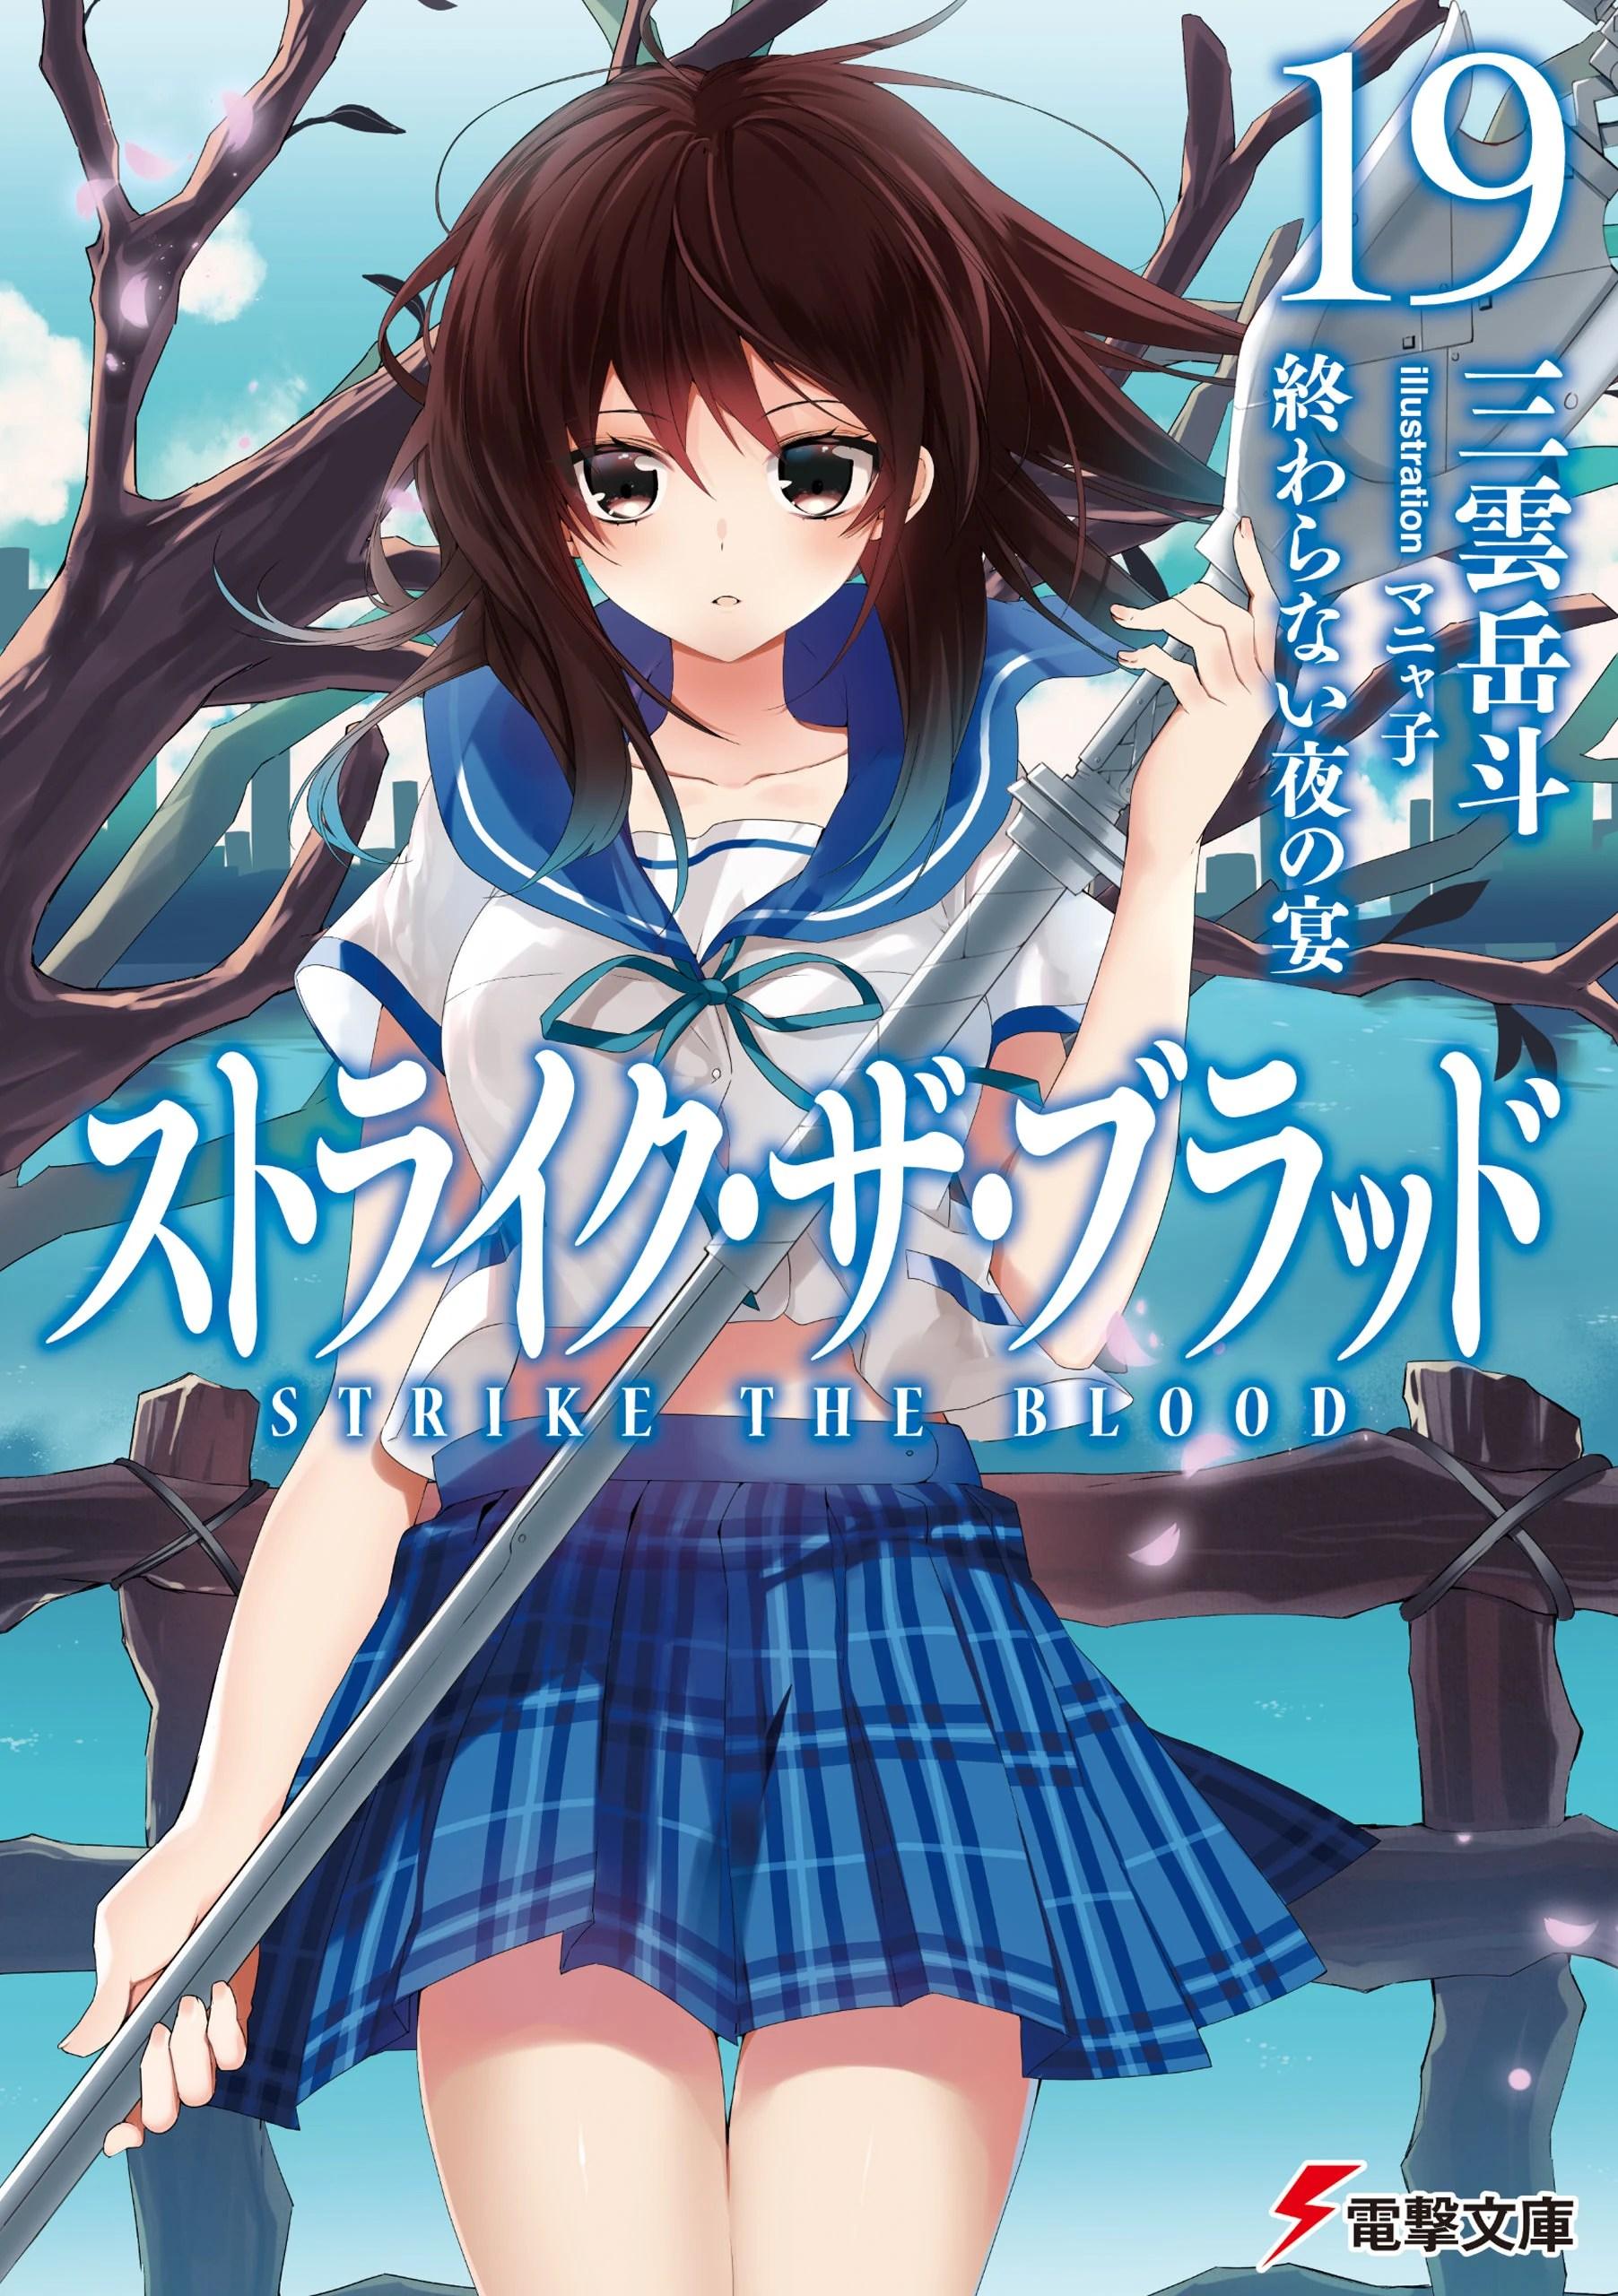 Light Novel Volume 19   Strike The Blood Wiki   FANDOM ...